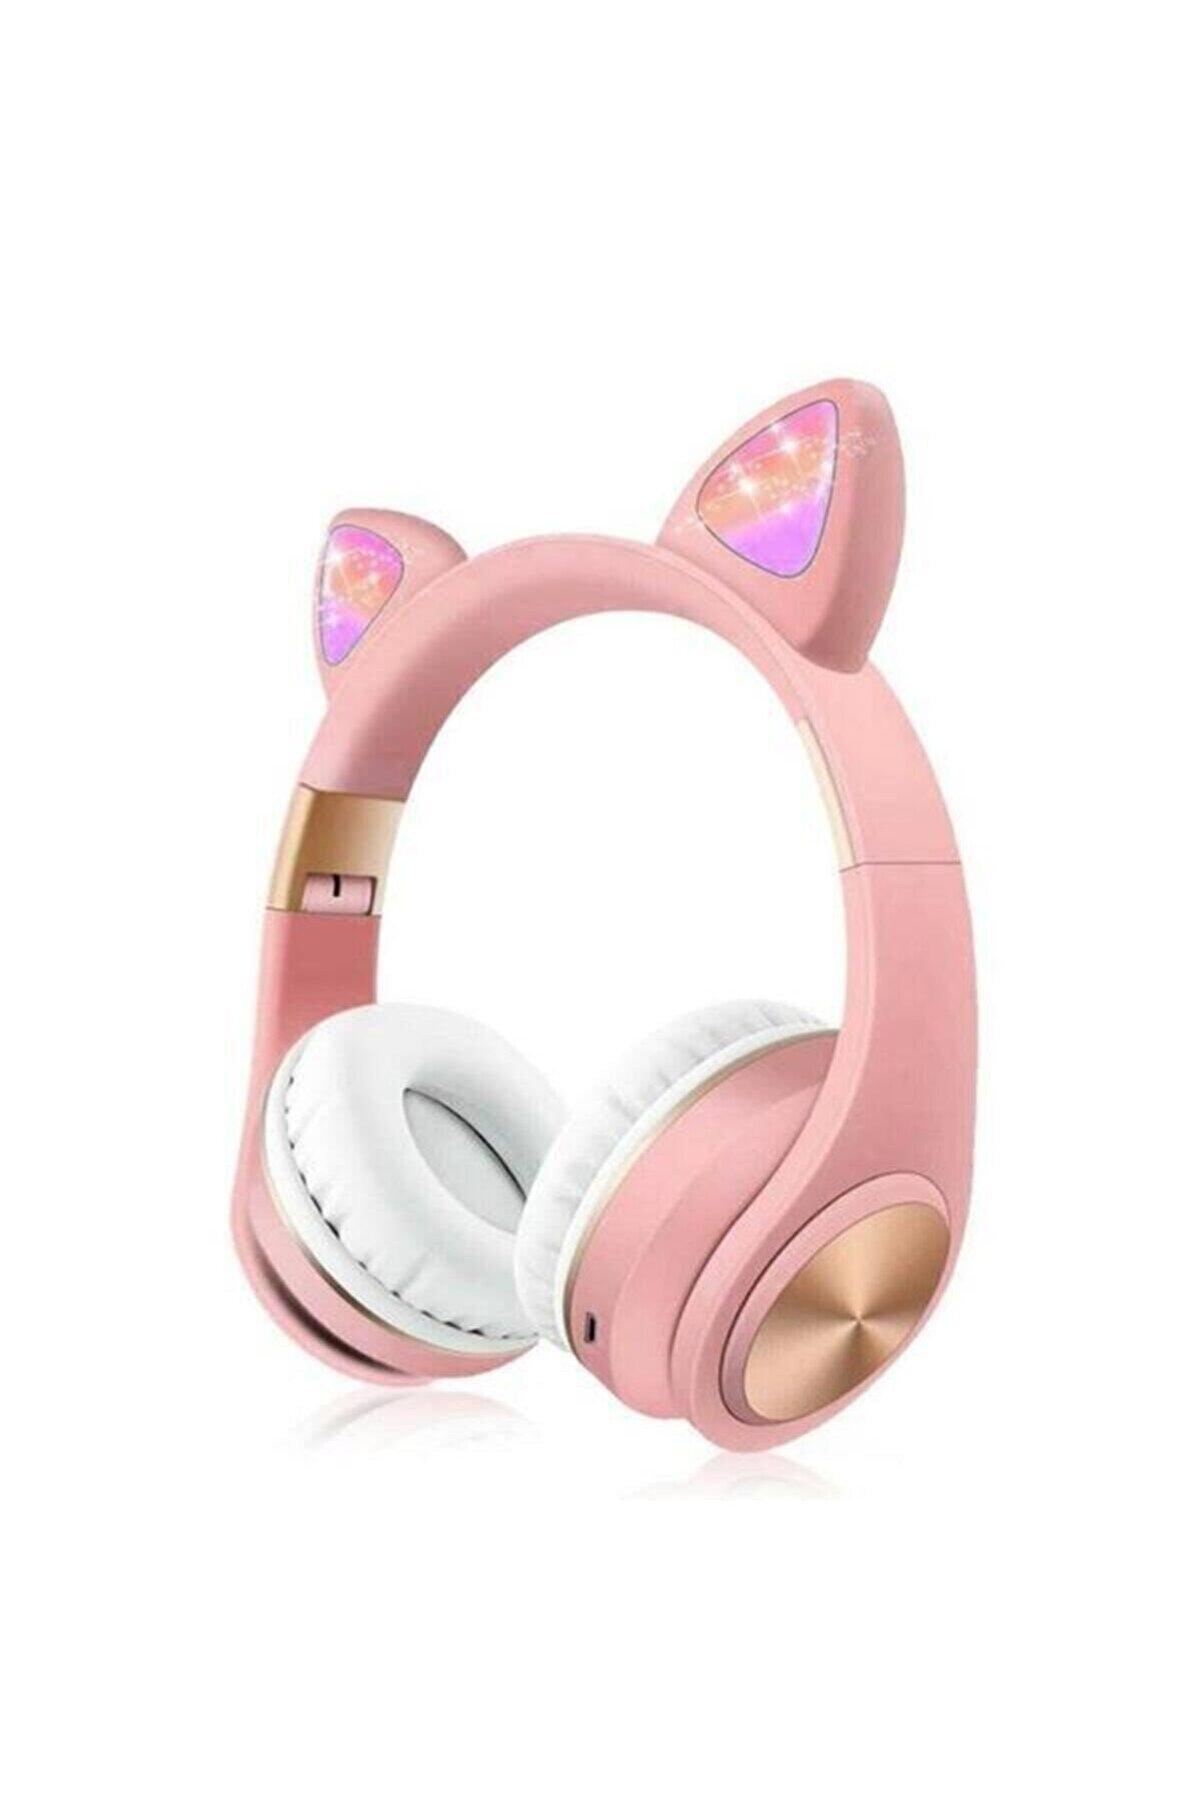 Syrox Budi Kablosuz Bluetooth Kedi Kulaklık Stereo Yüksek Ses Akıllı Renkli Led P68m